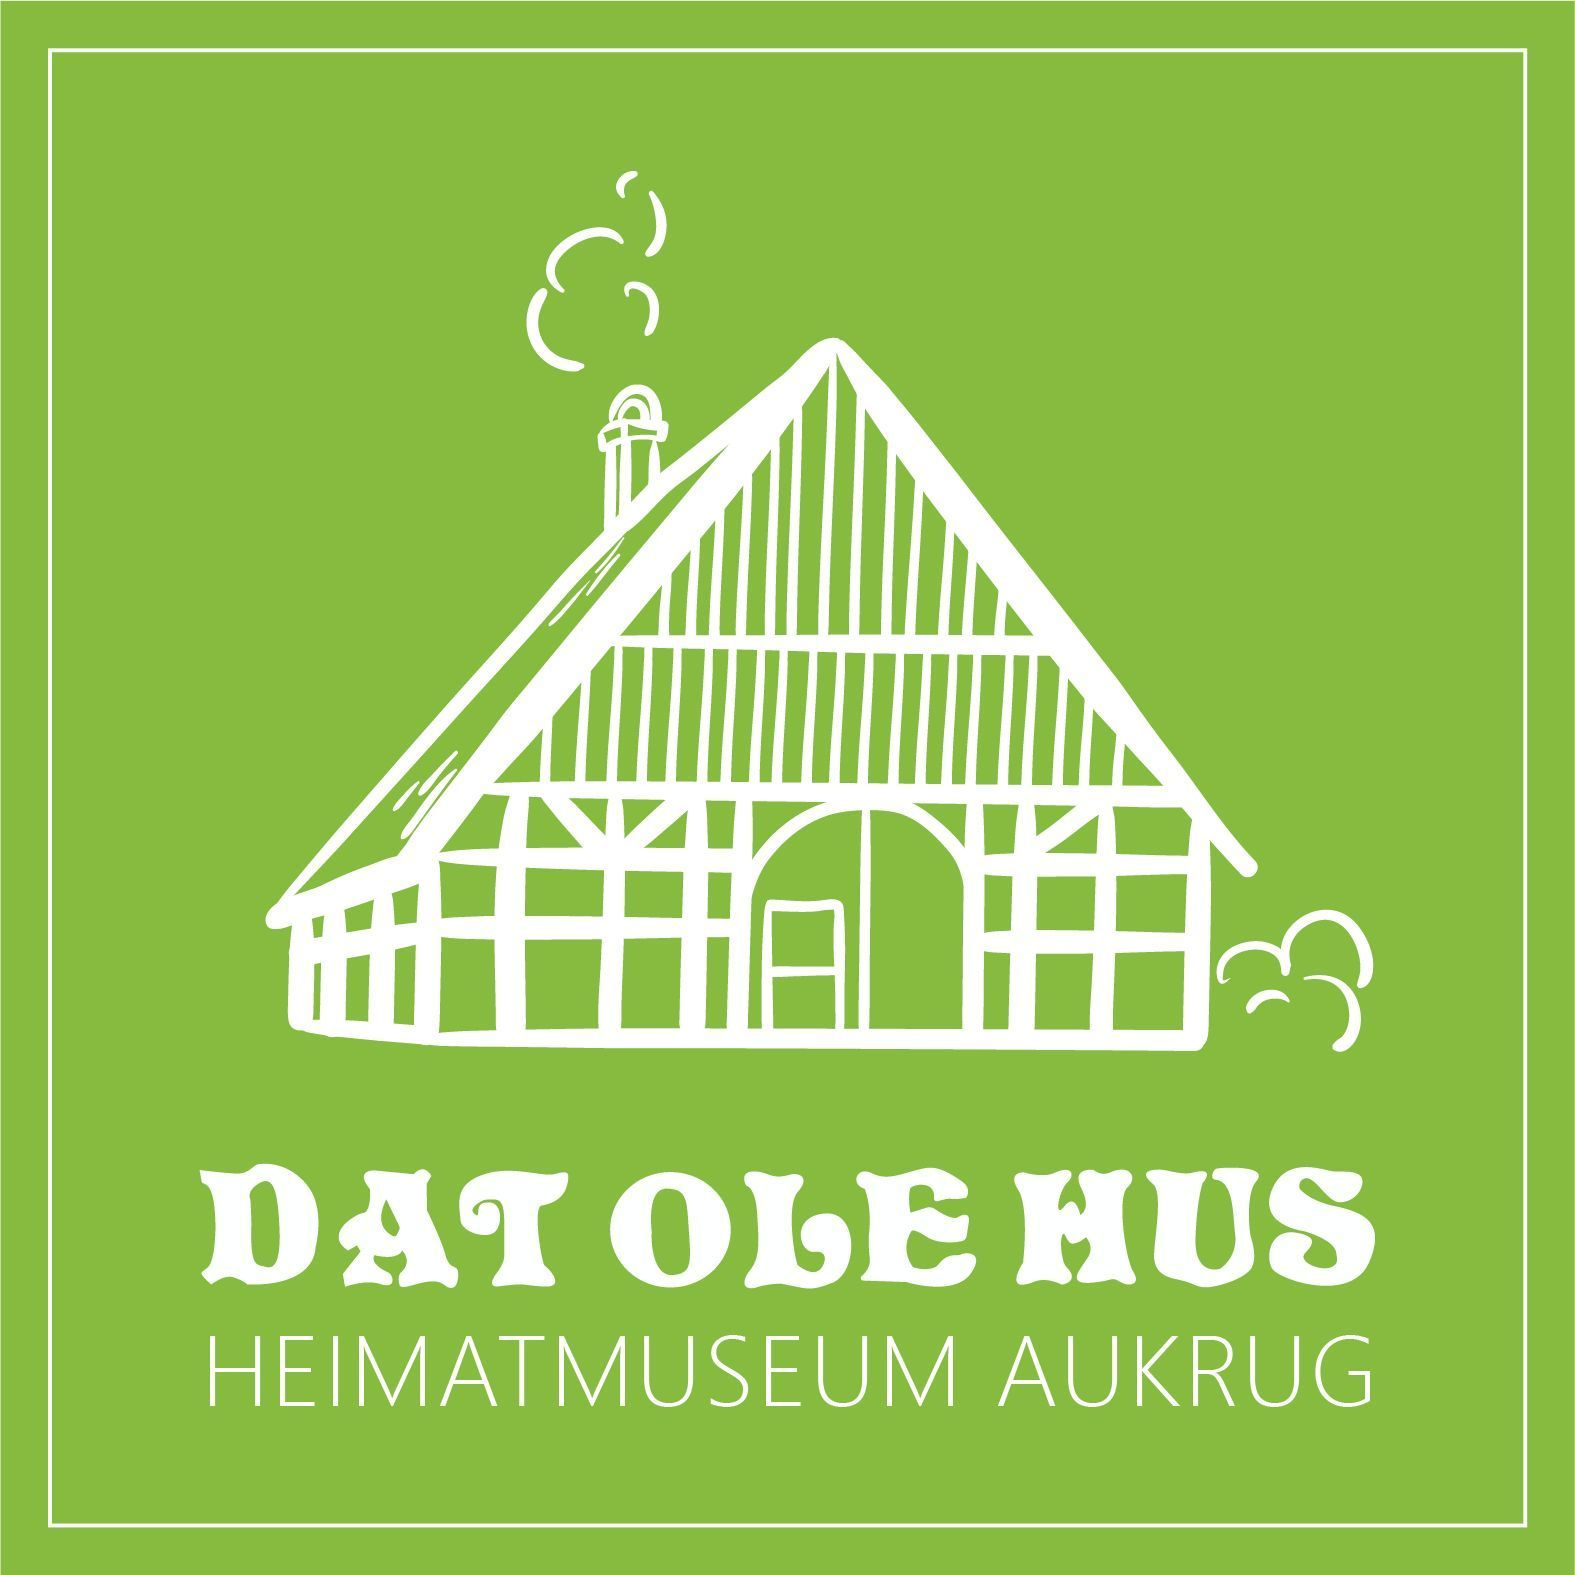 Herzlich Willkommen! | Dat Ole Hus